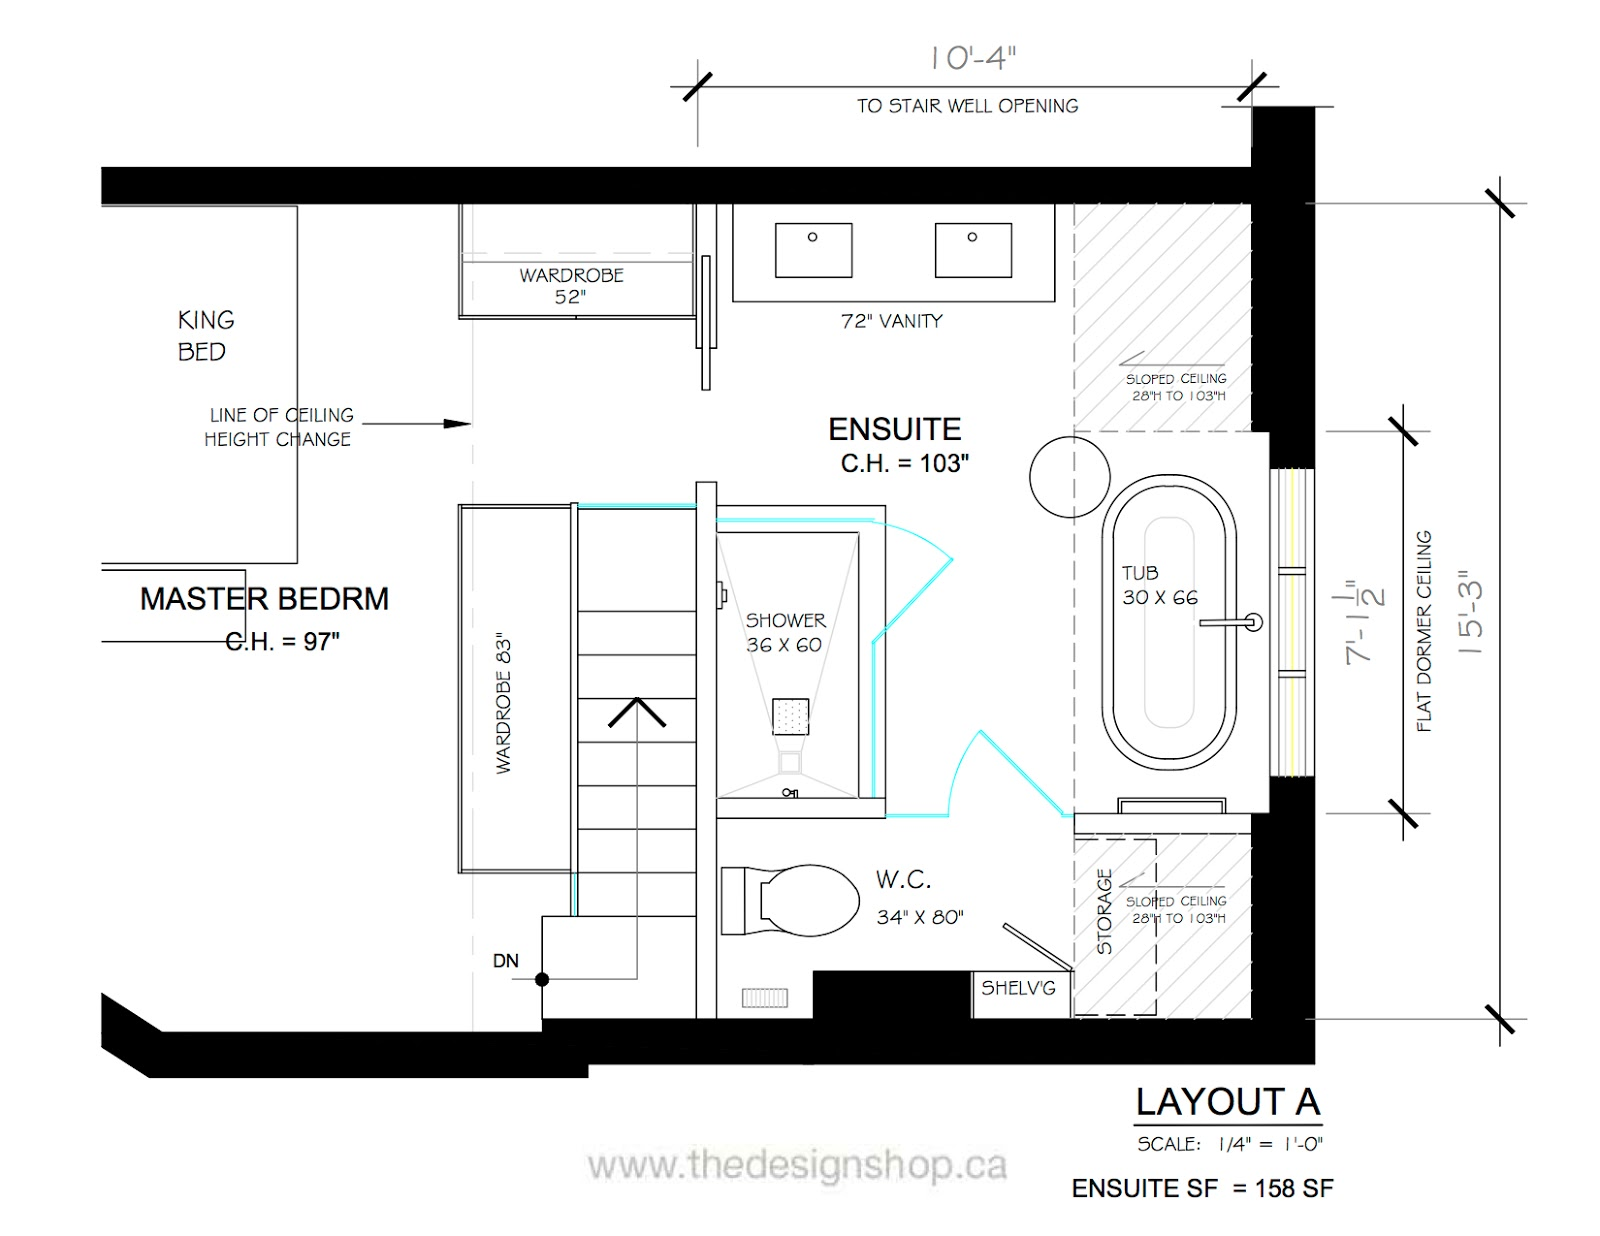 Creed E Design Bathroom From Concept To Sneak Peek